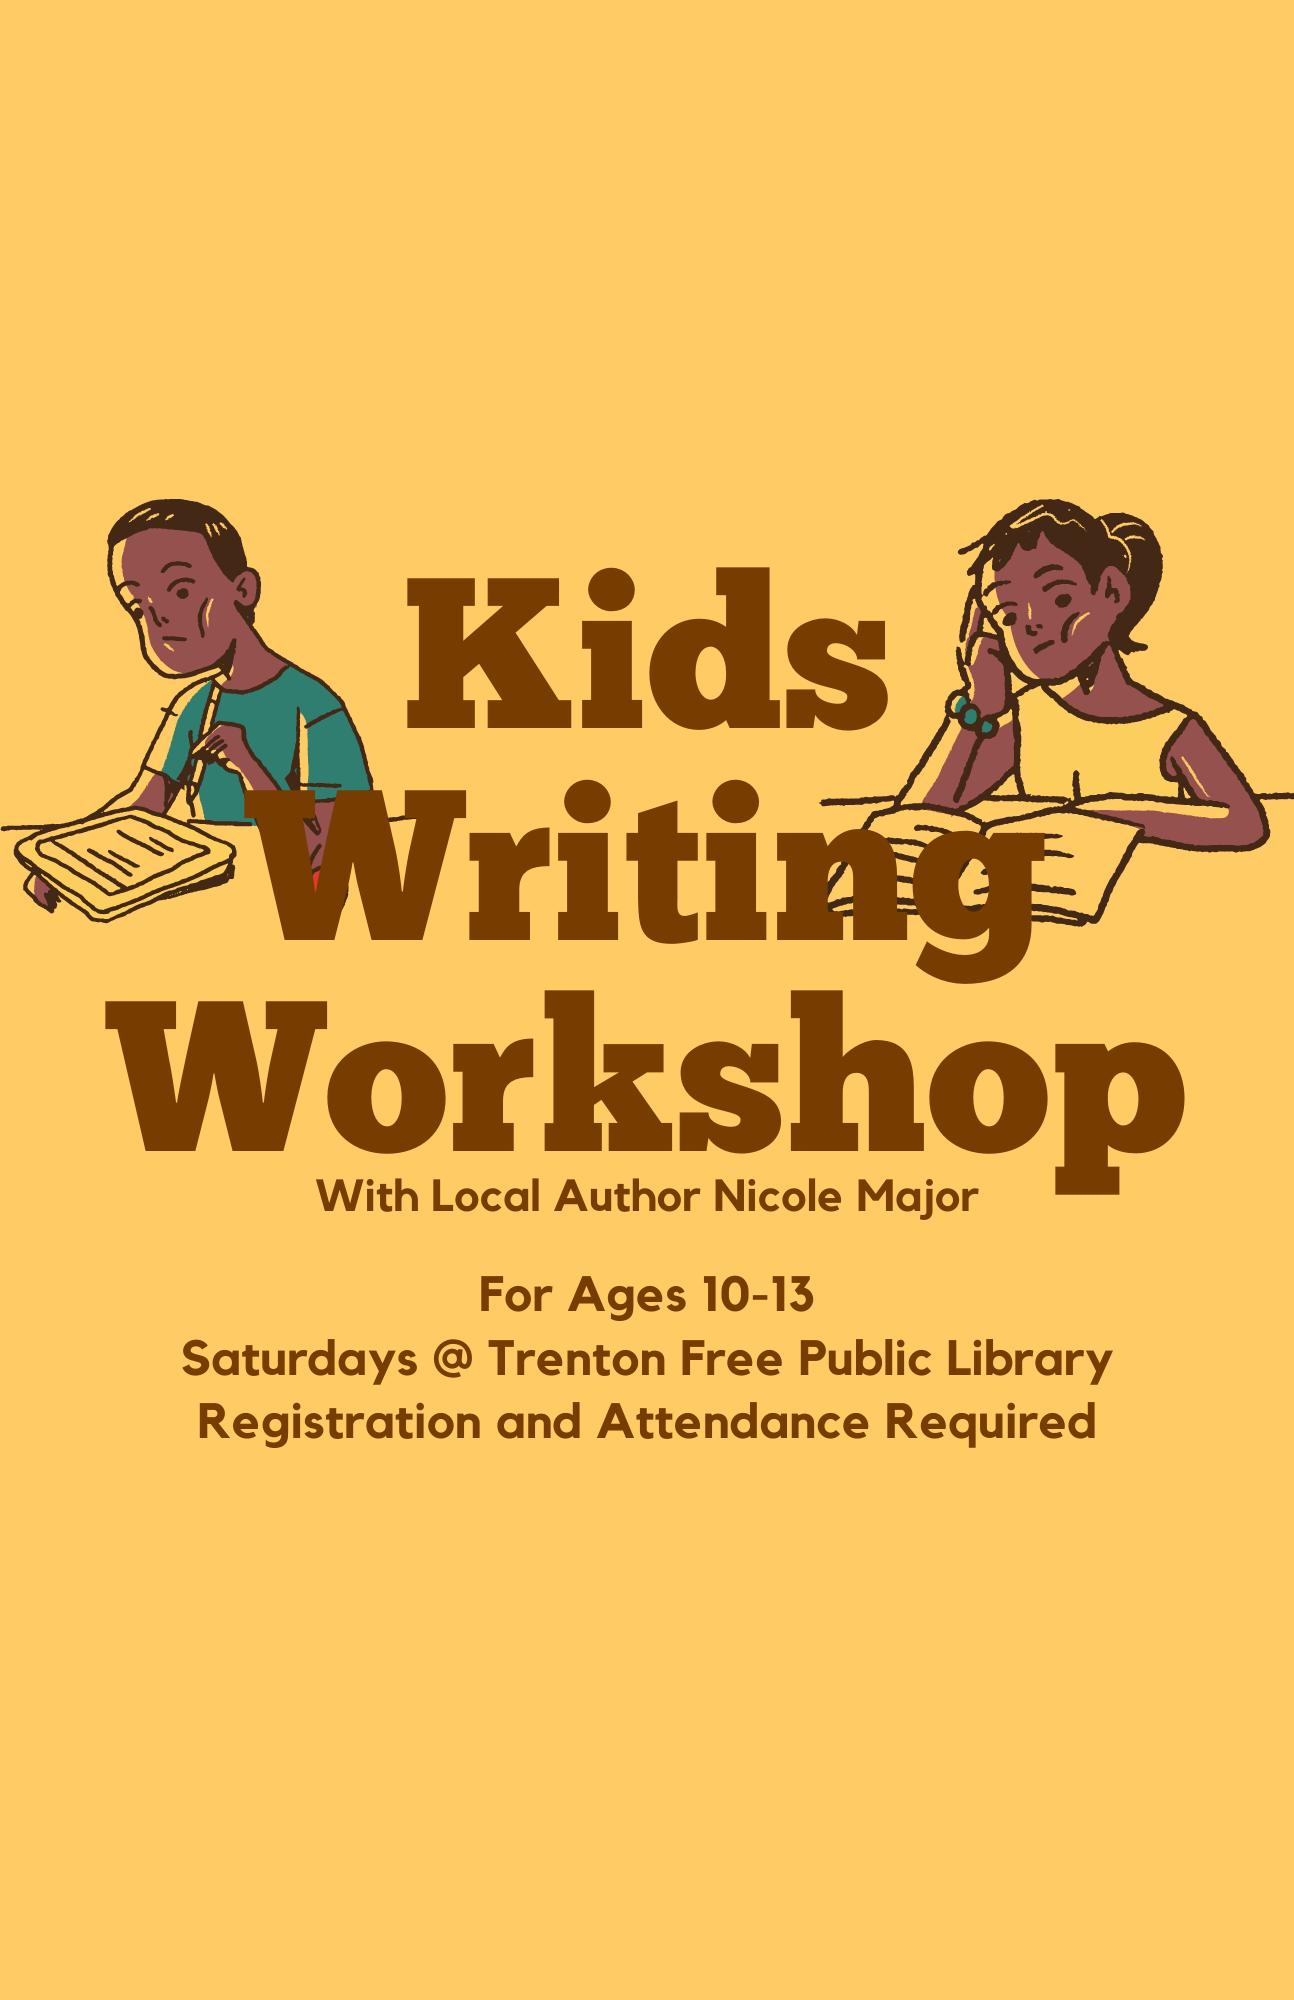 Writing Workshop for Pre-teens